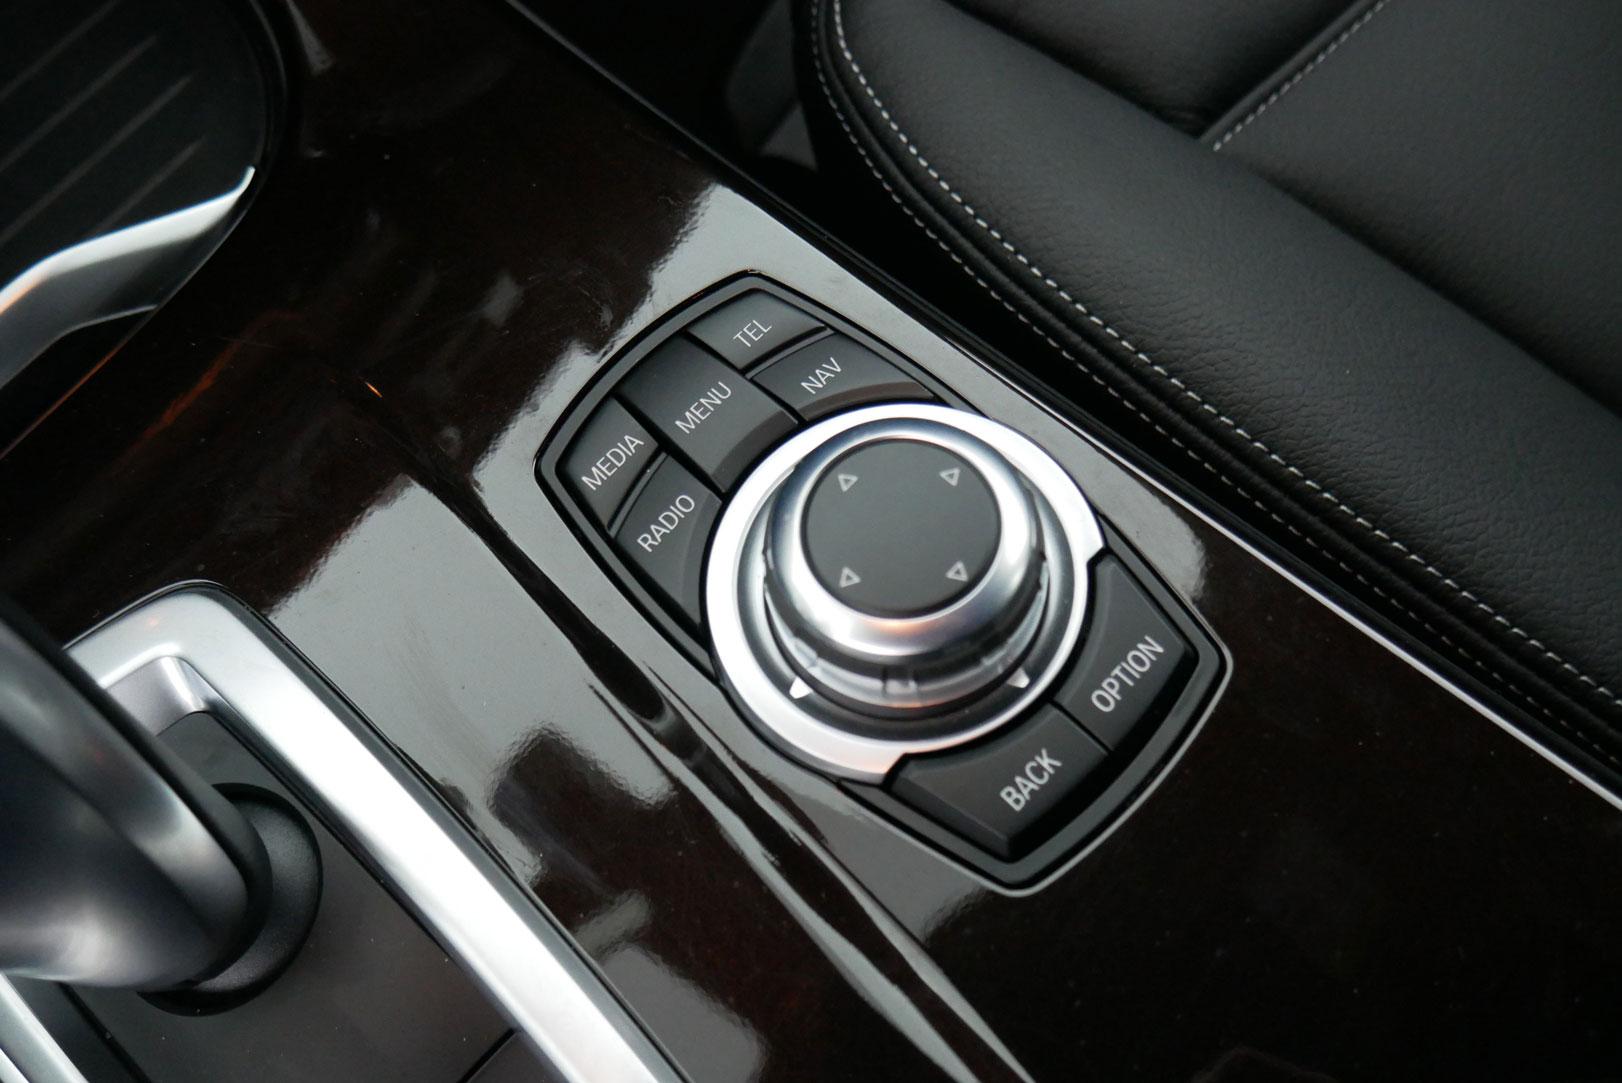 photo voiture detail carlab.fr